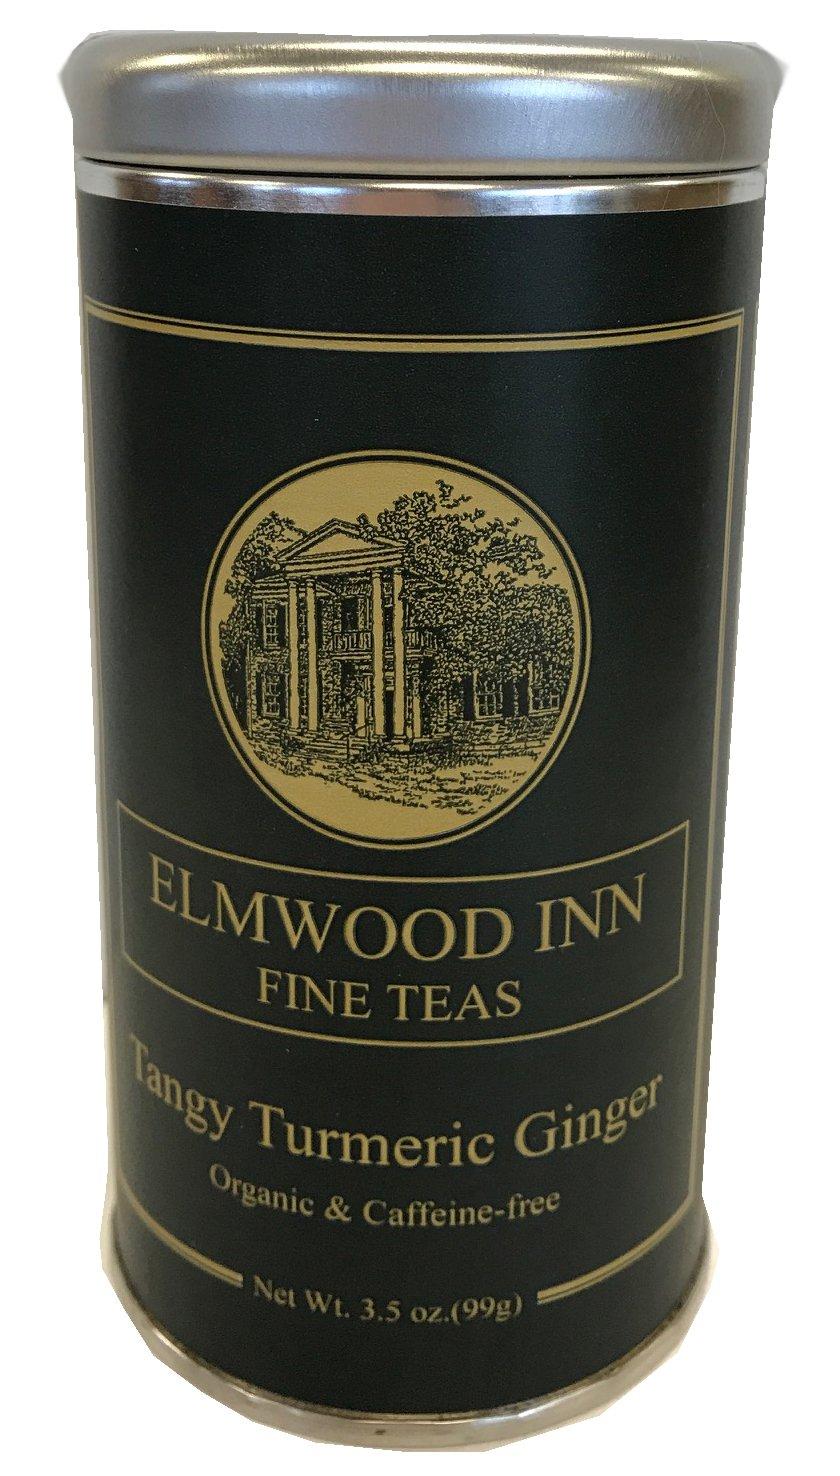 Elmwood Inn Fine Teas - Tangy Tumeric Ginger - Loose Leaf 3.5 Ounce Tin, Organic & Caffeine-Free